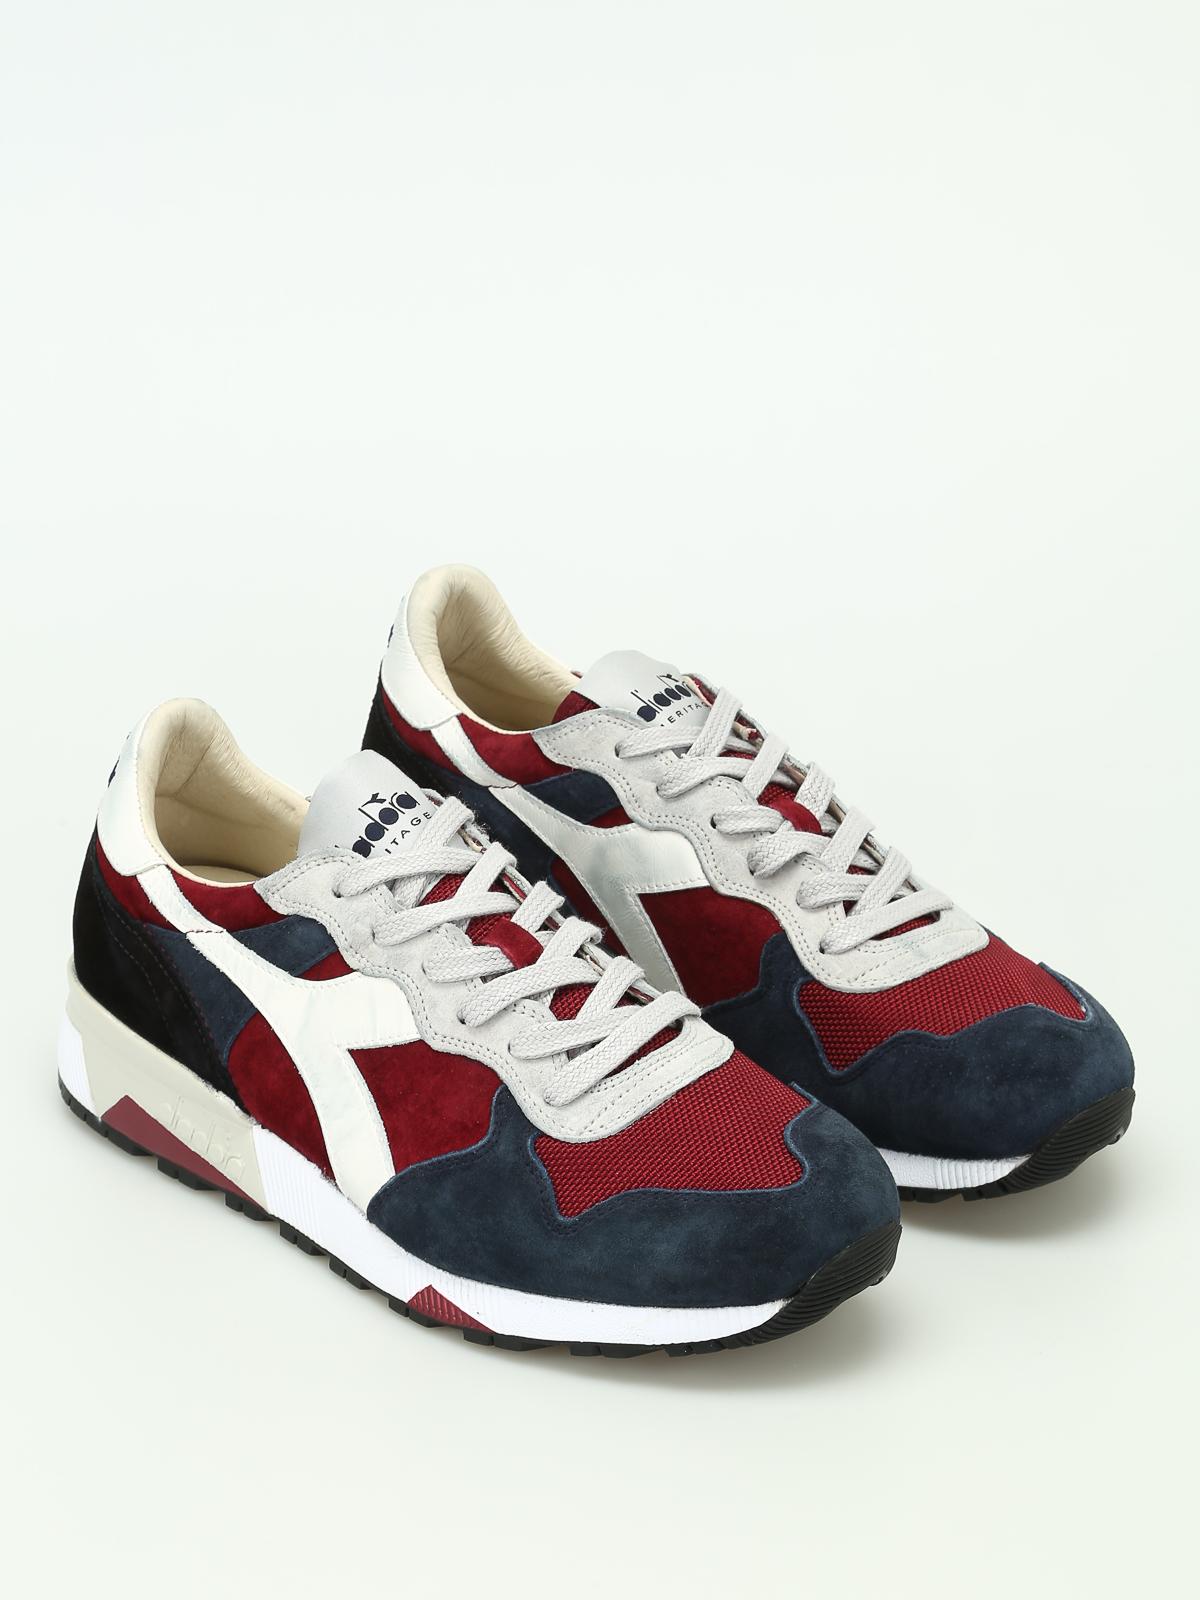 Diadora - Trident 90 S sneakers